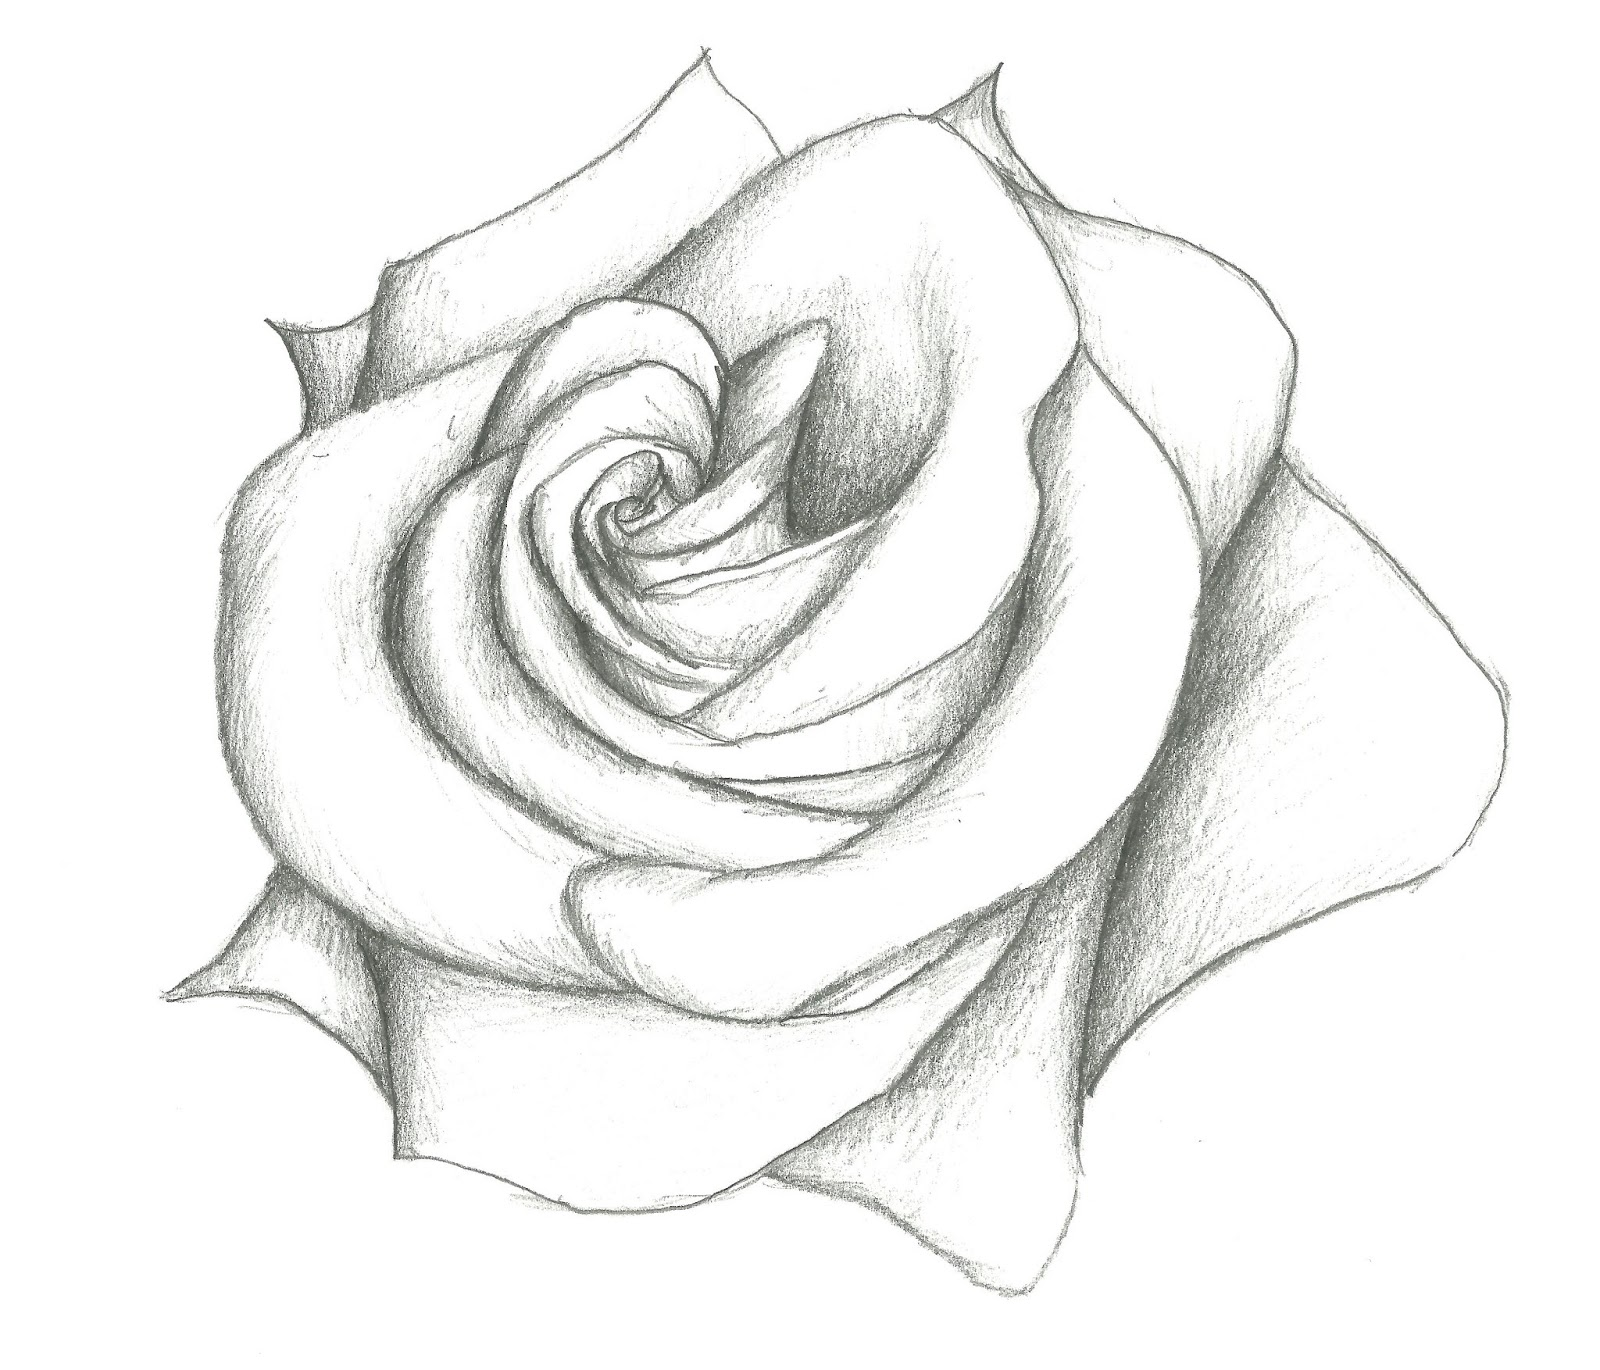 Rose Drawing In Pencil | Auto Design Tech